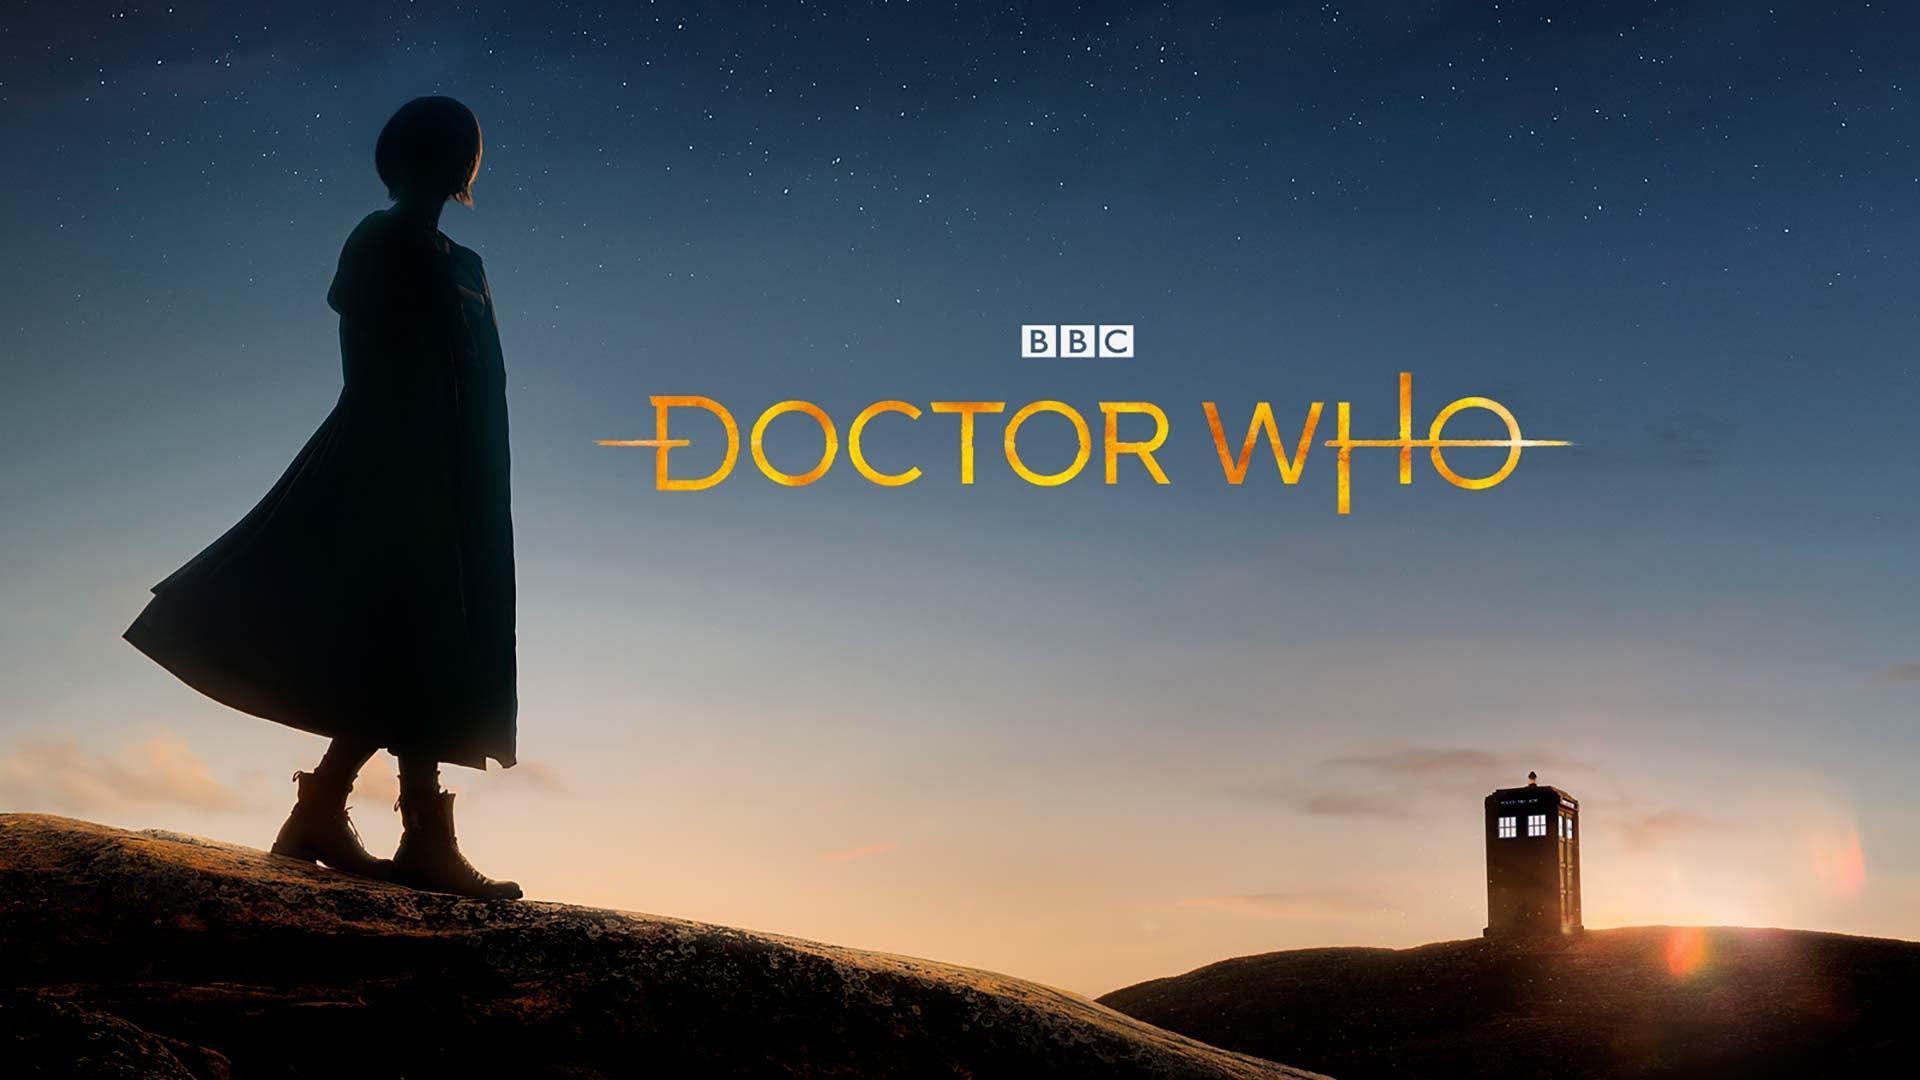 Doctor Who Has A Fresh, New Logo For Season 11